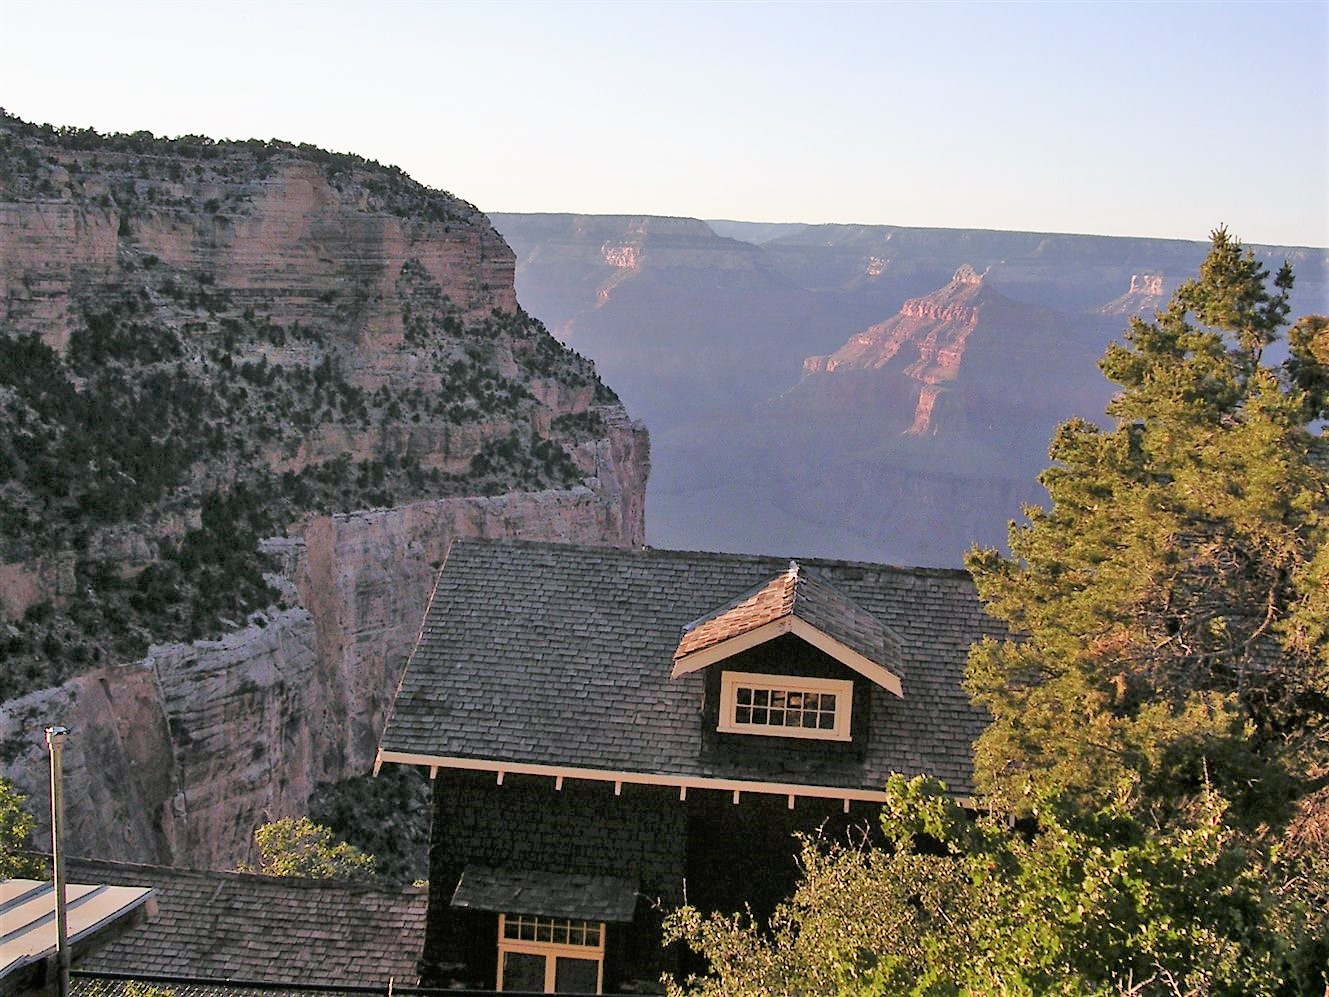 2005 06 26 Grand Canyon 55.jpg